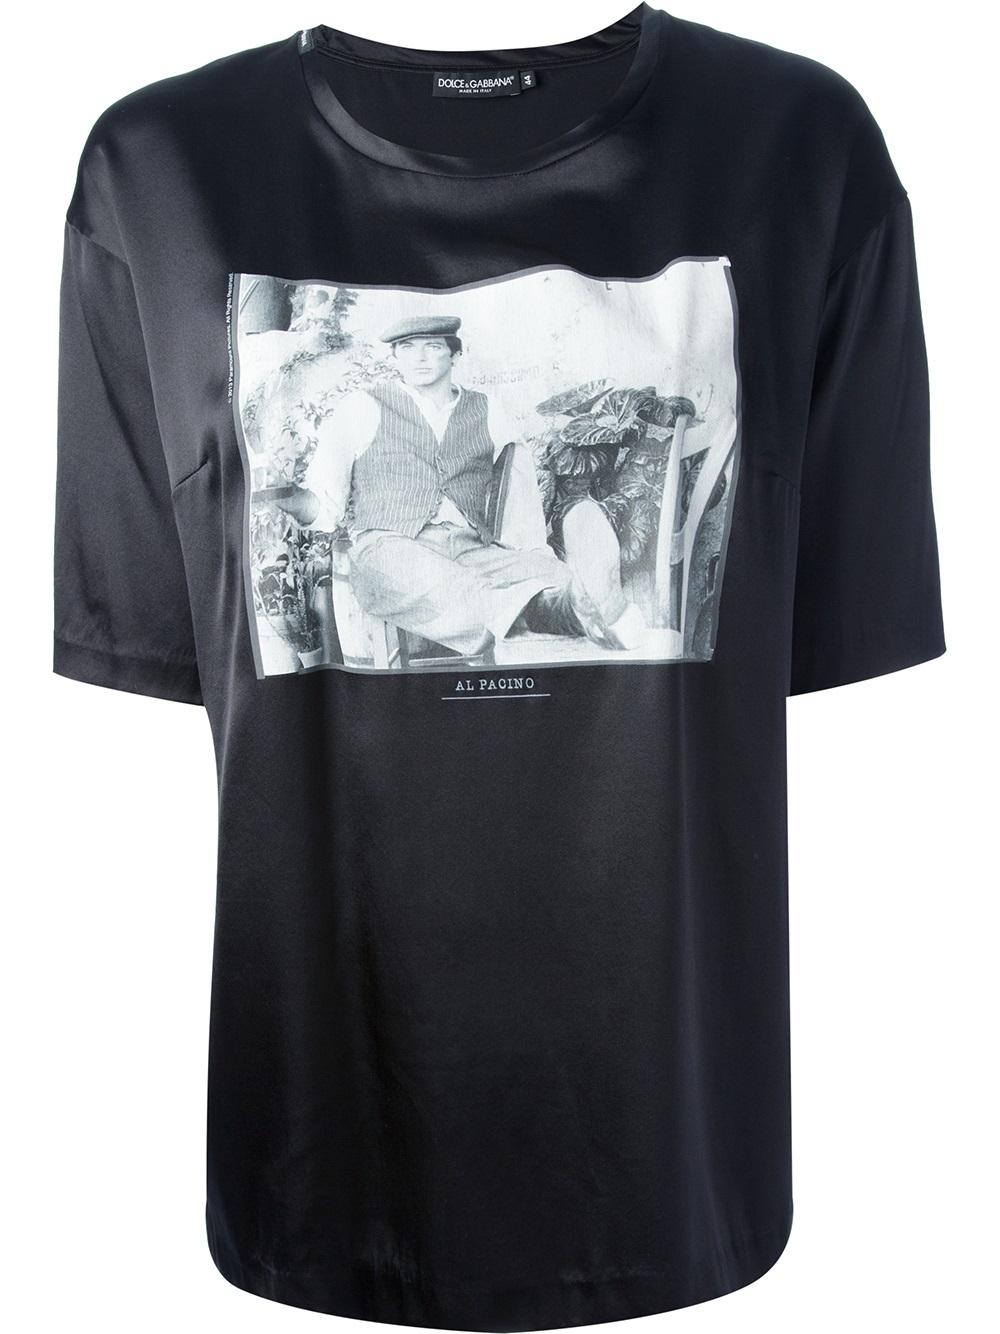 dolce gabbana al pacino t shirt in black lyst. Black Bedroom Furniture Sets. Home Design Ideas